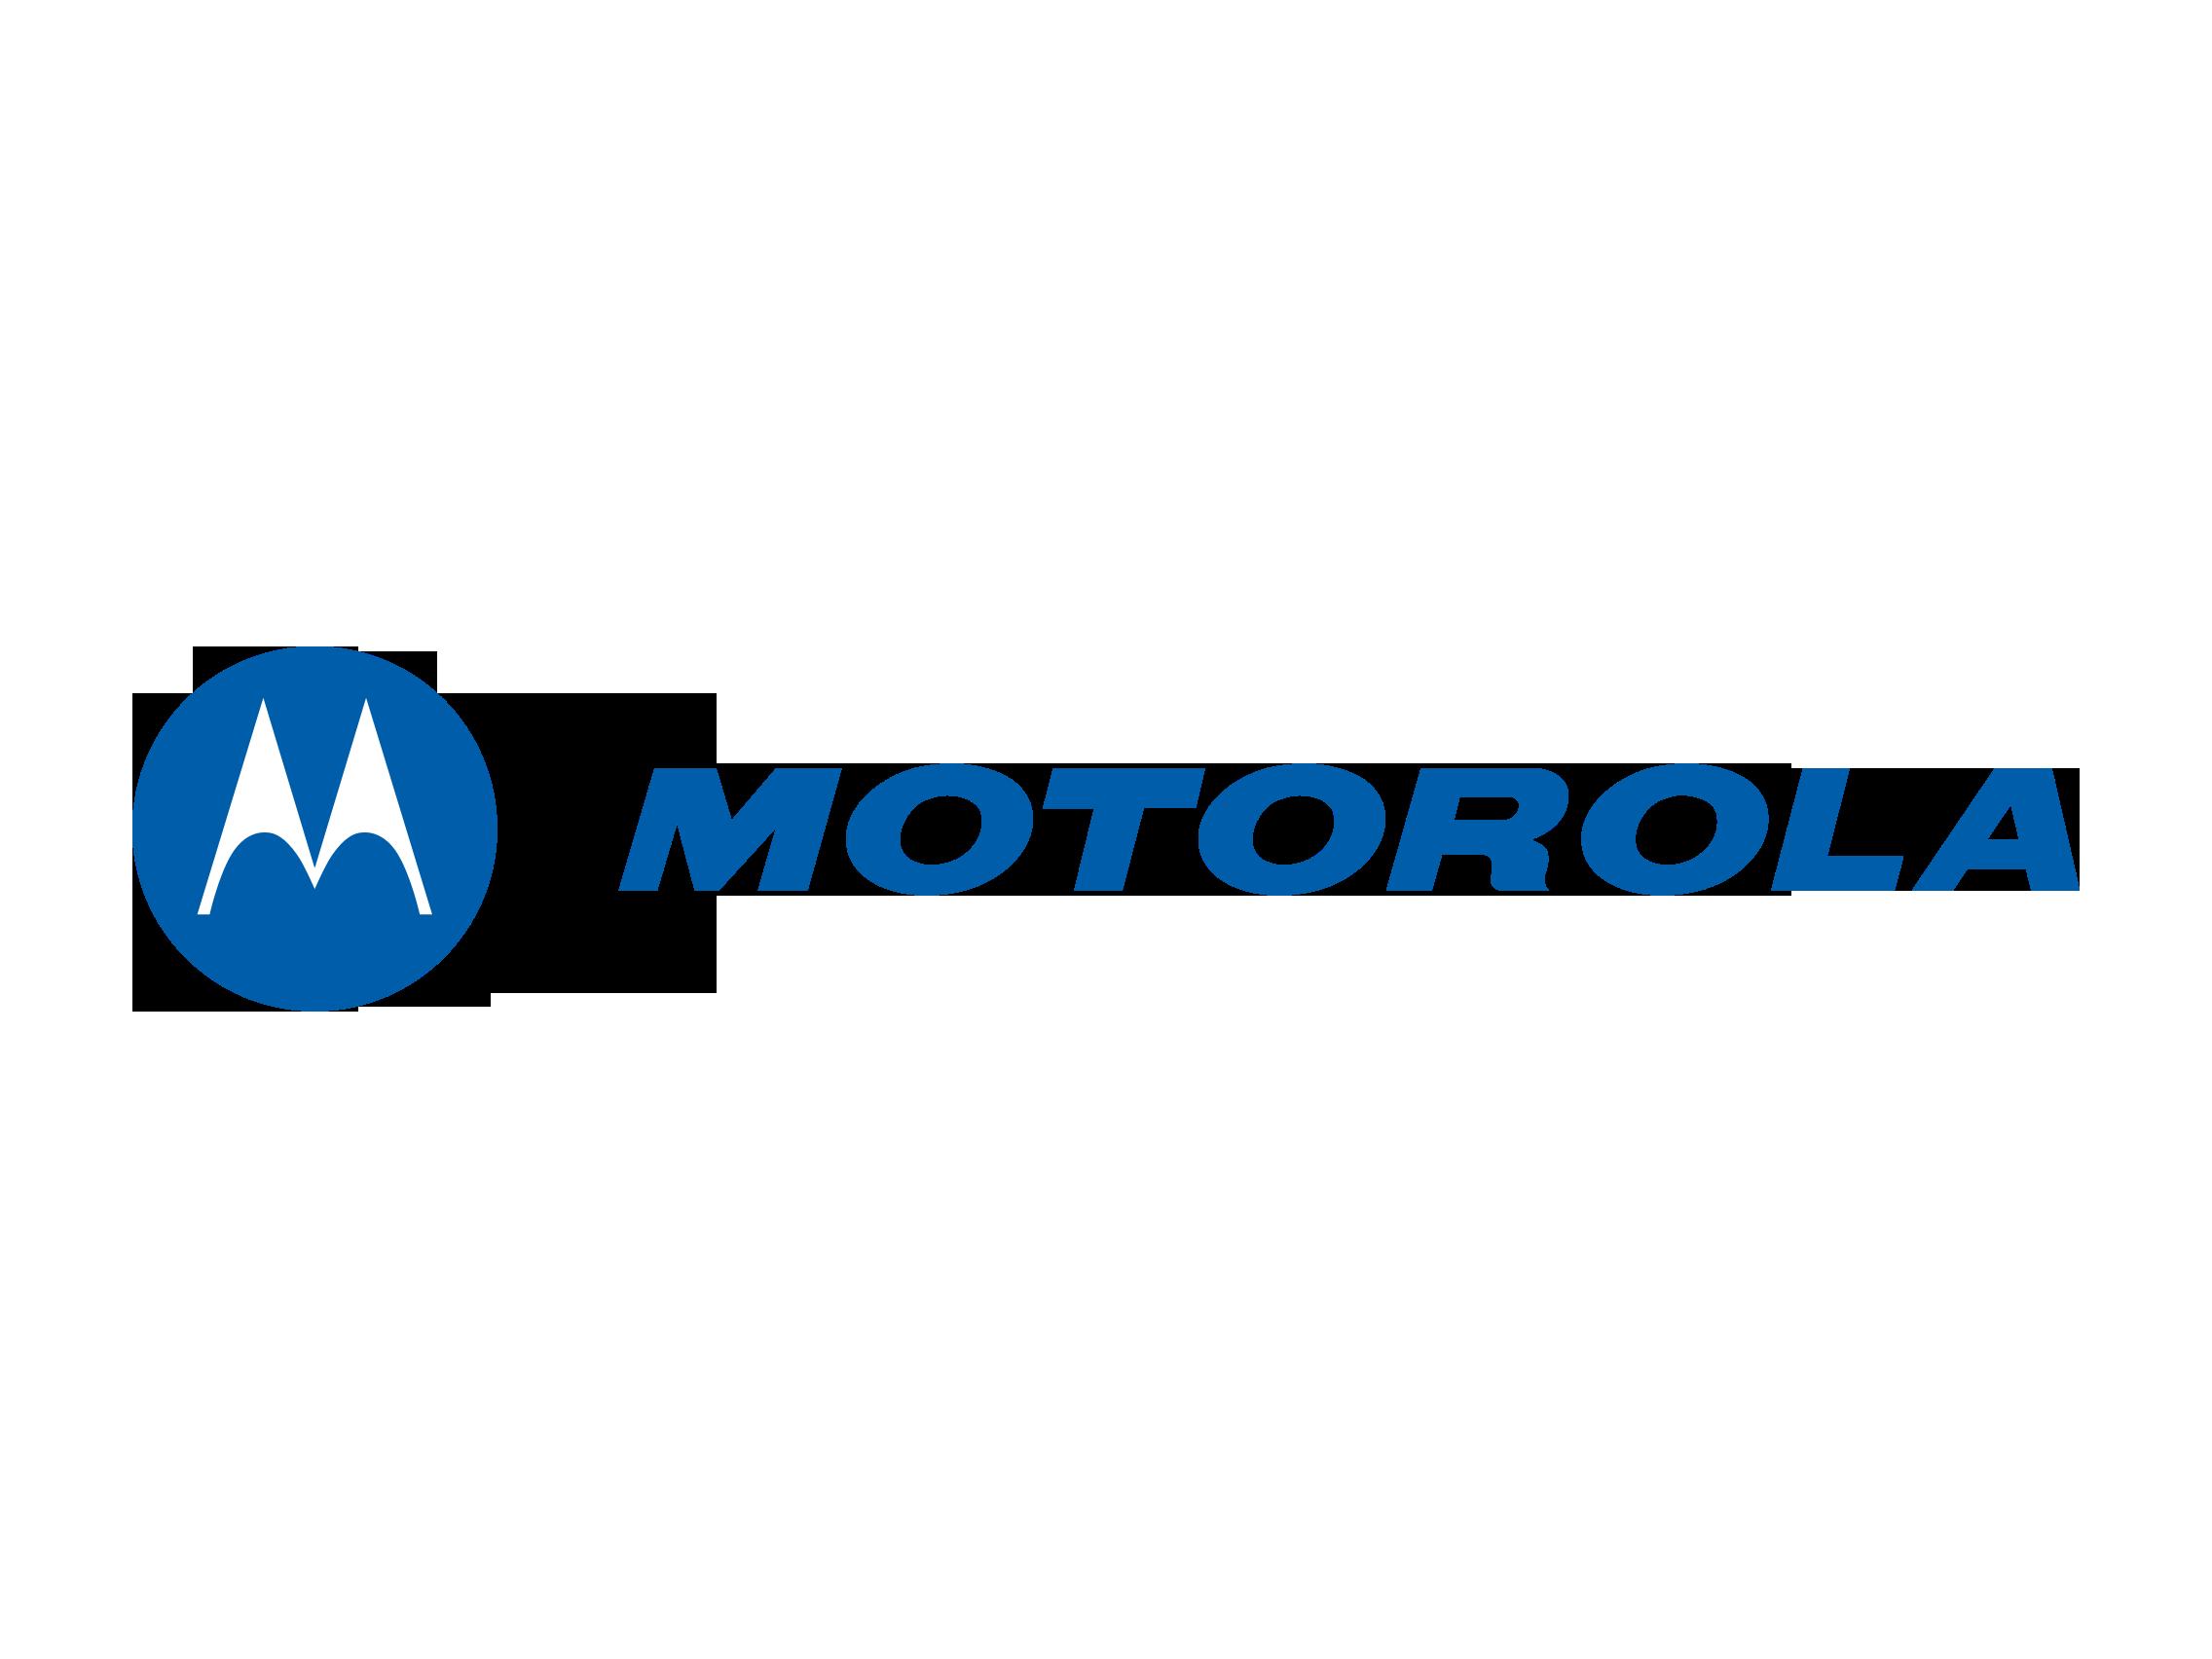 Motorola-logo-original-blue.png